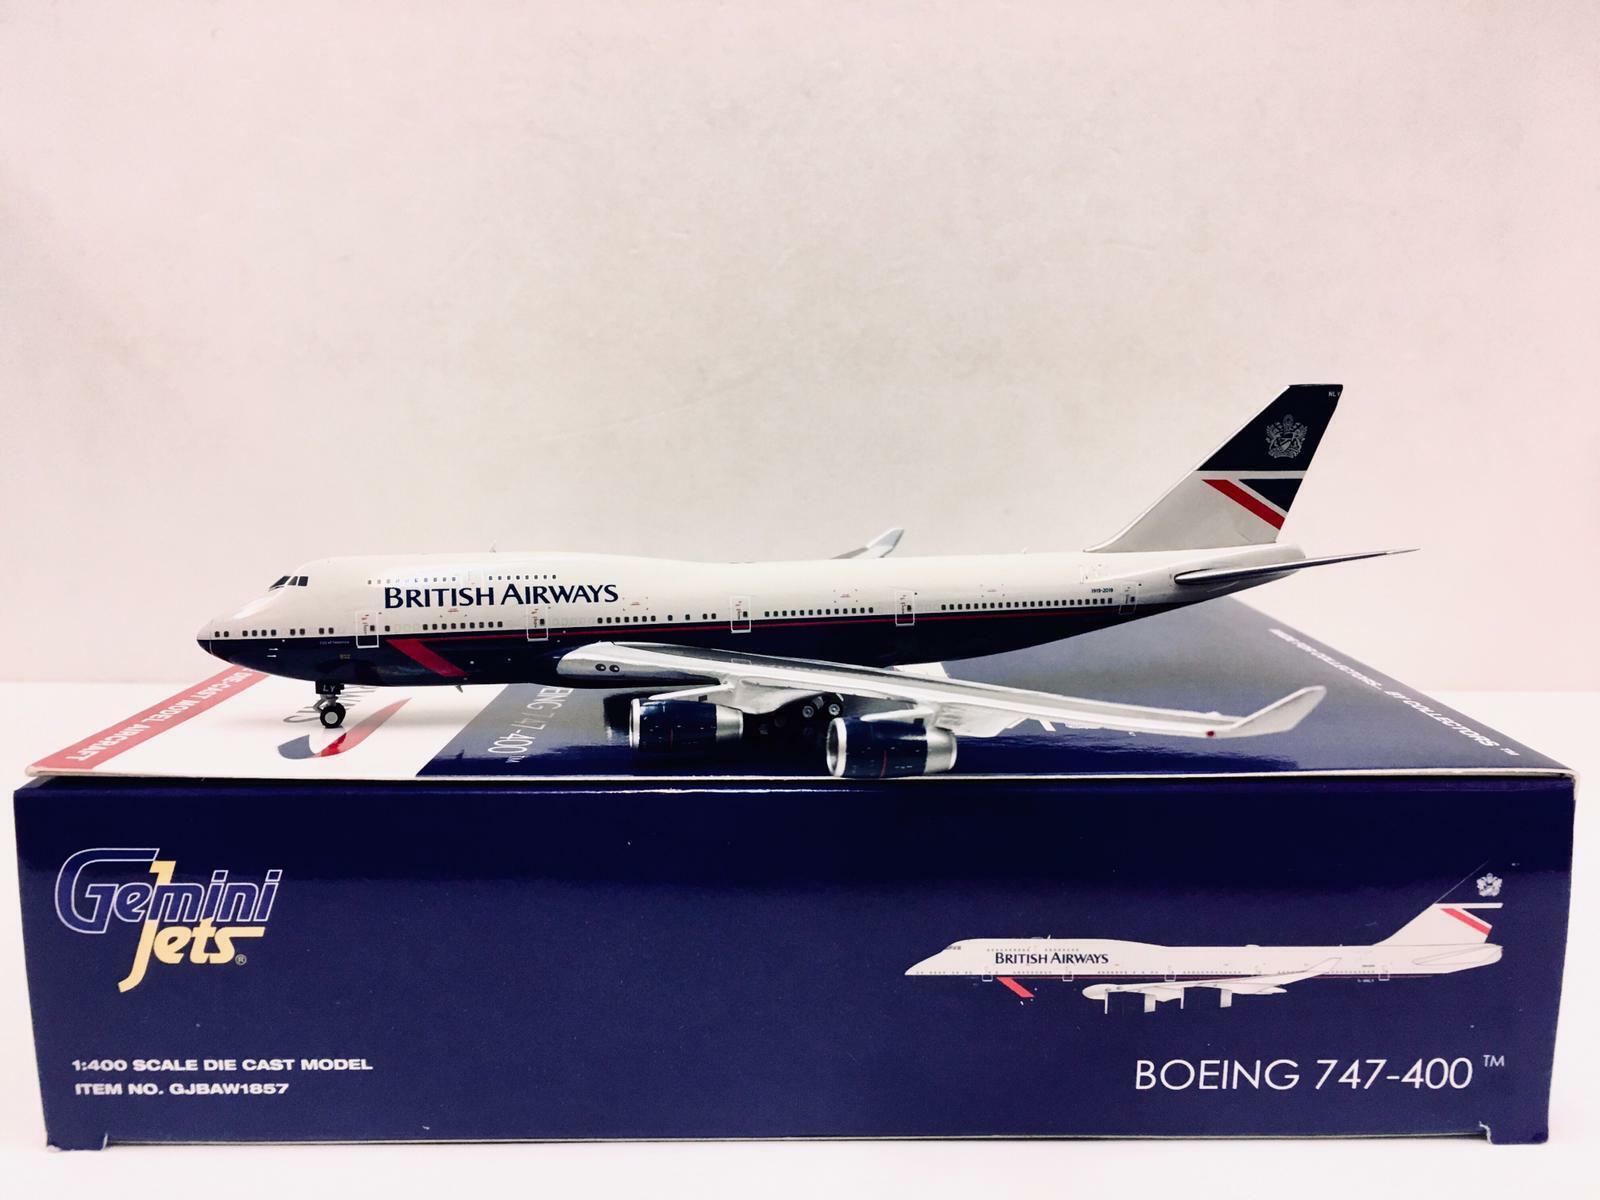 GEMINI JETS BRITISH AIRWAYS BOEING 747-400 1:400 LANDOR GJBAW1857 IN STOCK